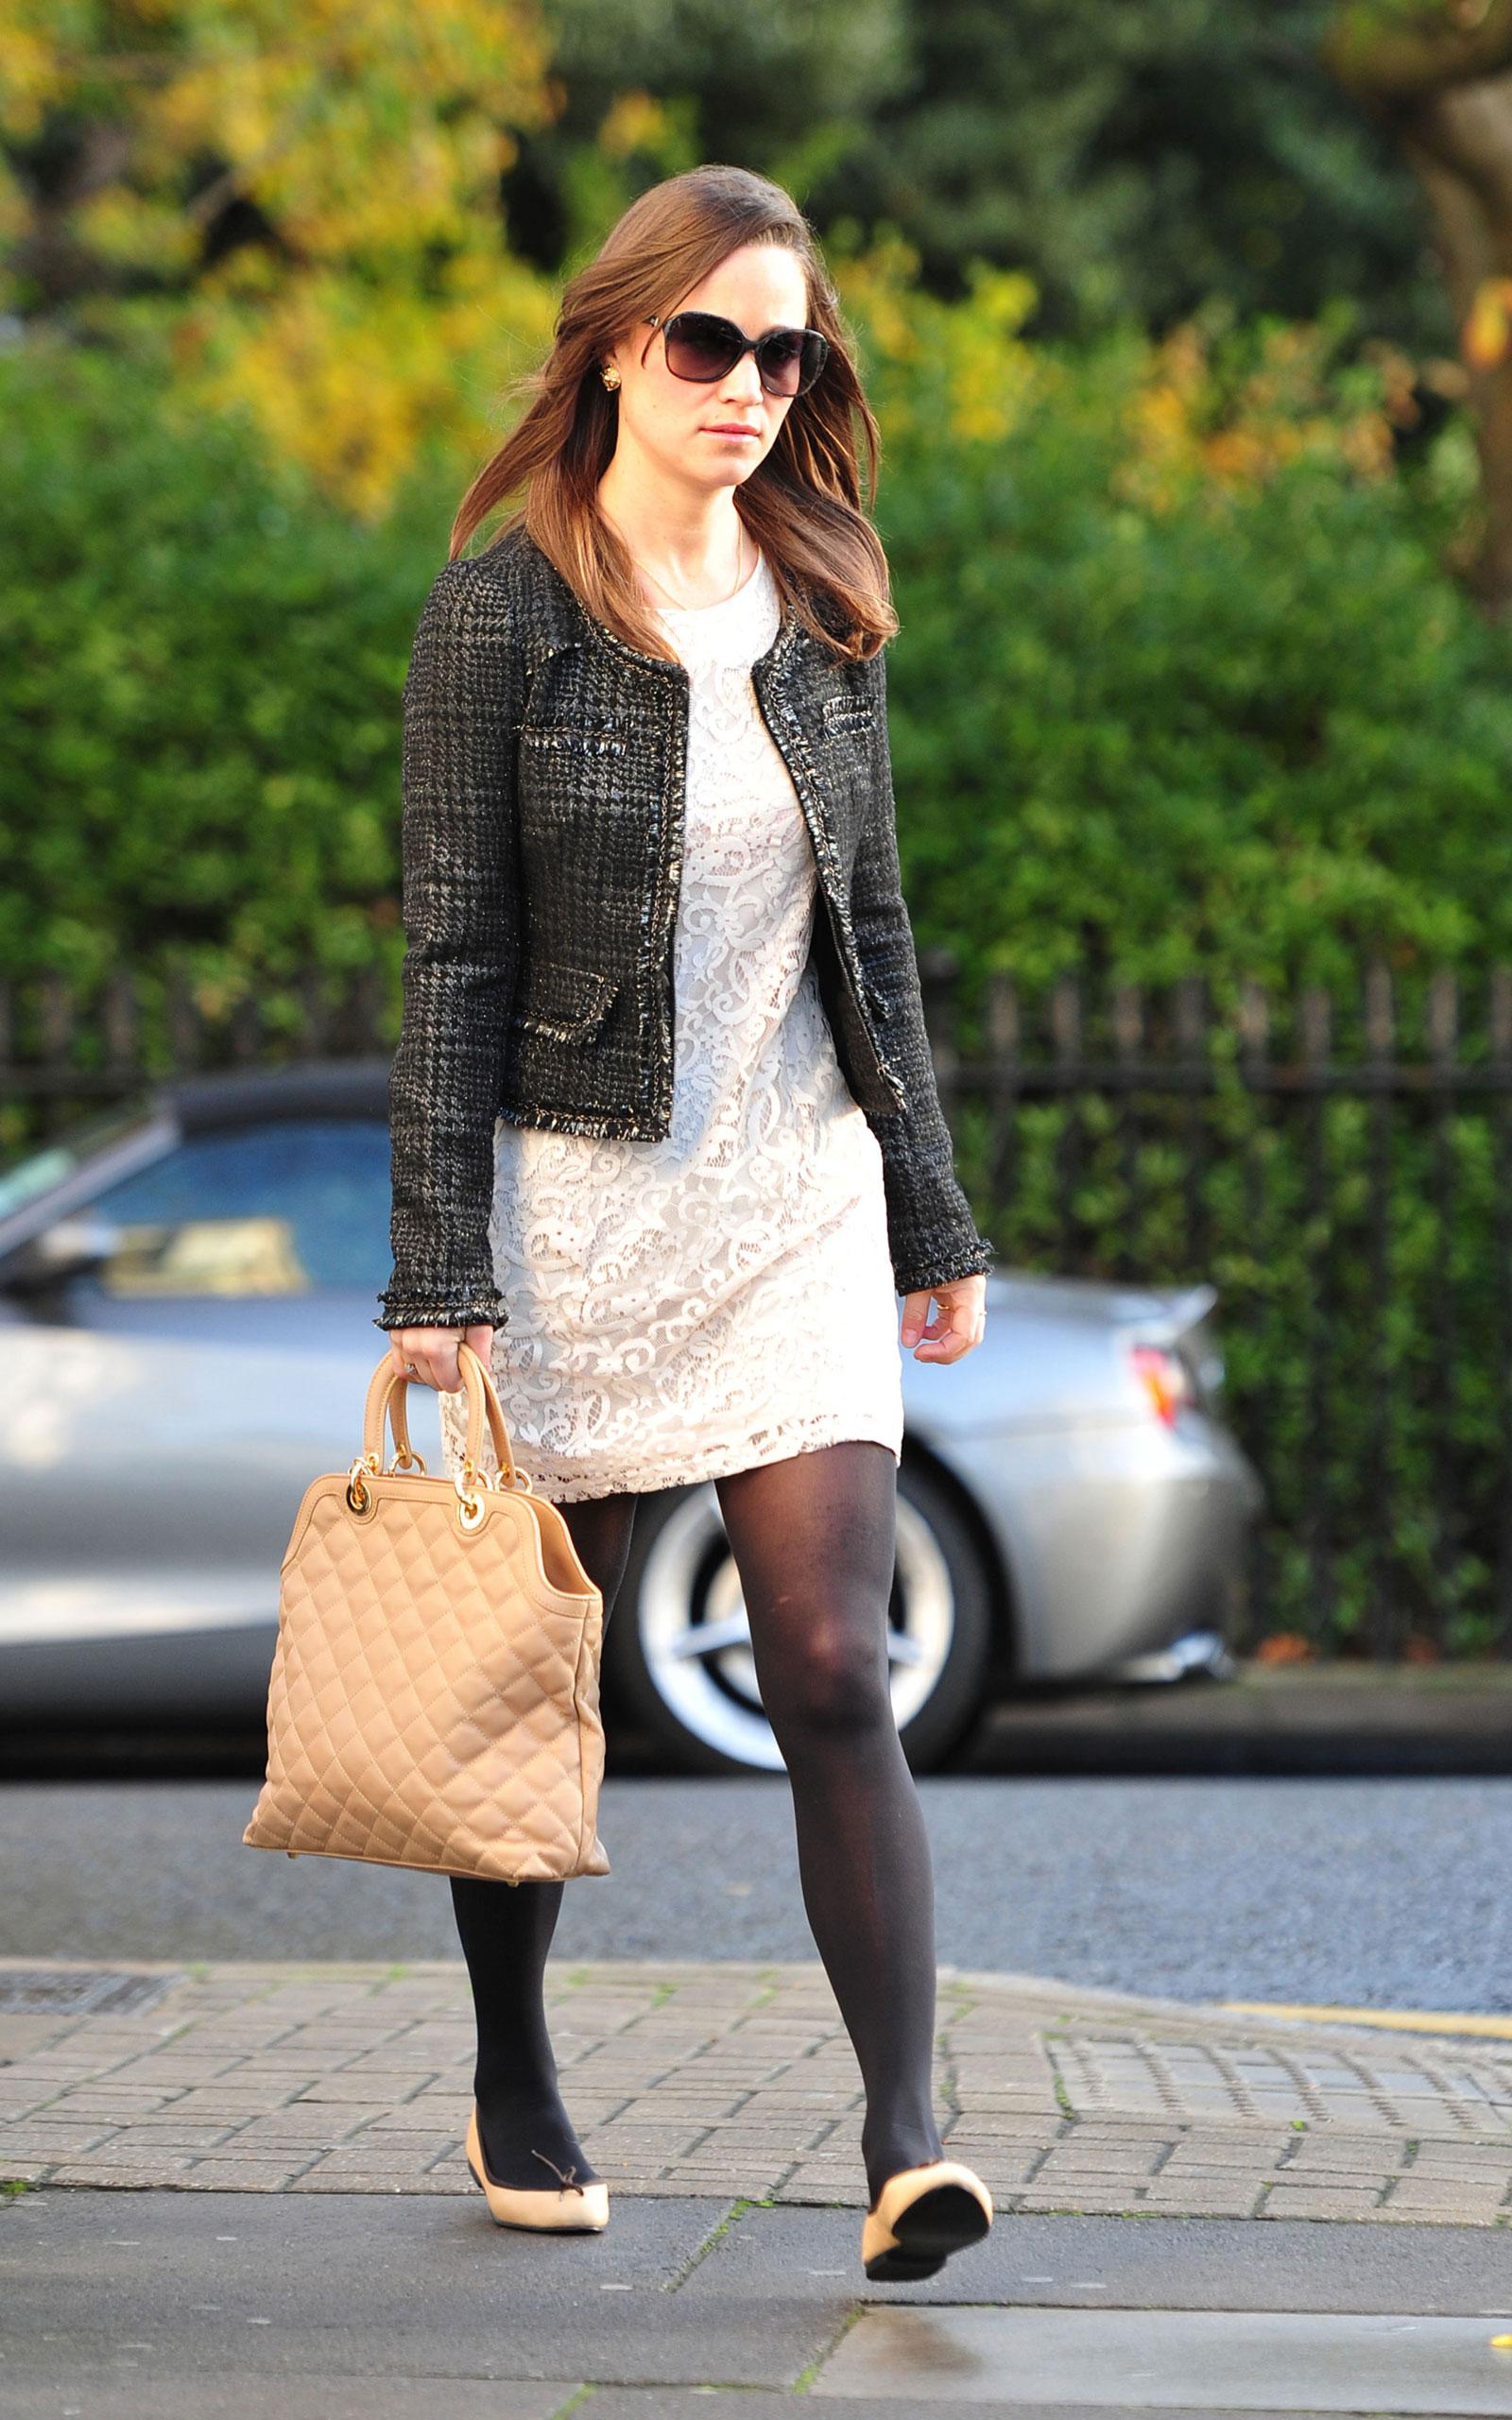 pippa middleton leggy in white dress heading to work